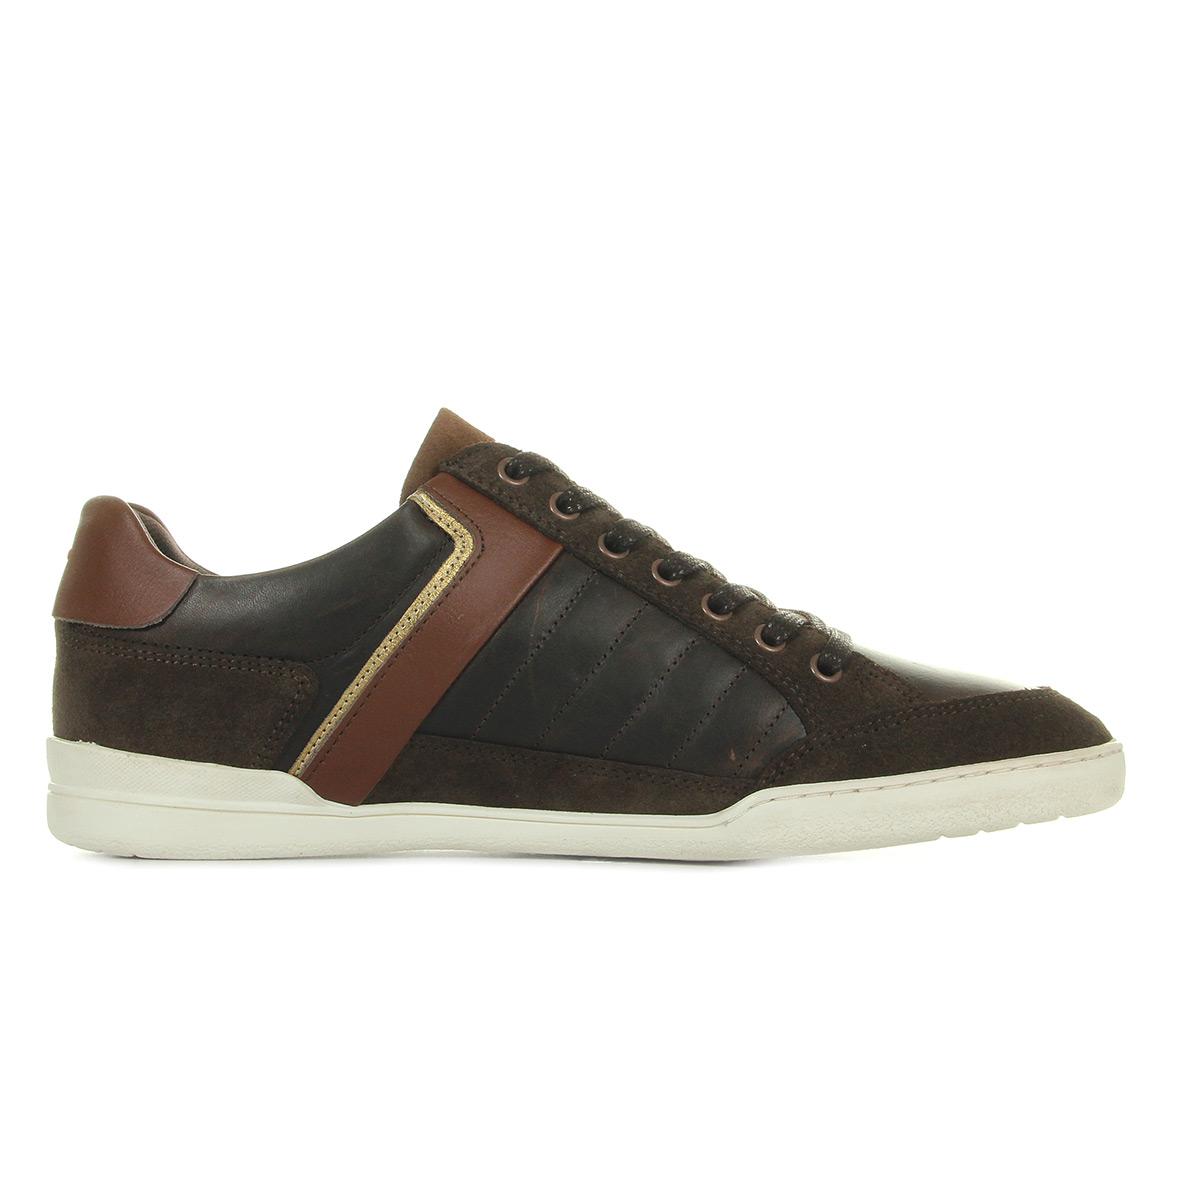 Le Coq Sportif Alsace Low Leather Suede 1810532, Baskets mode homme